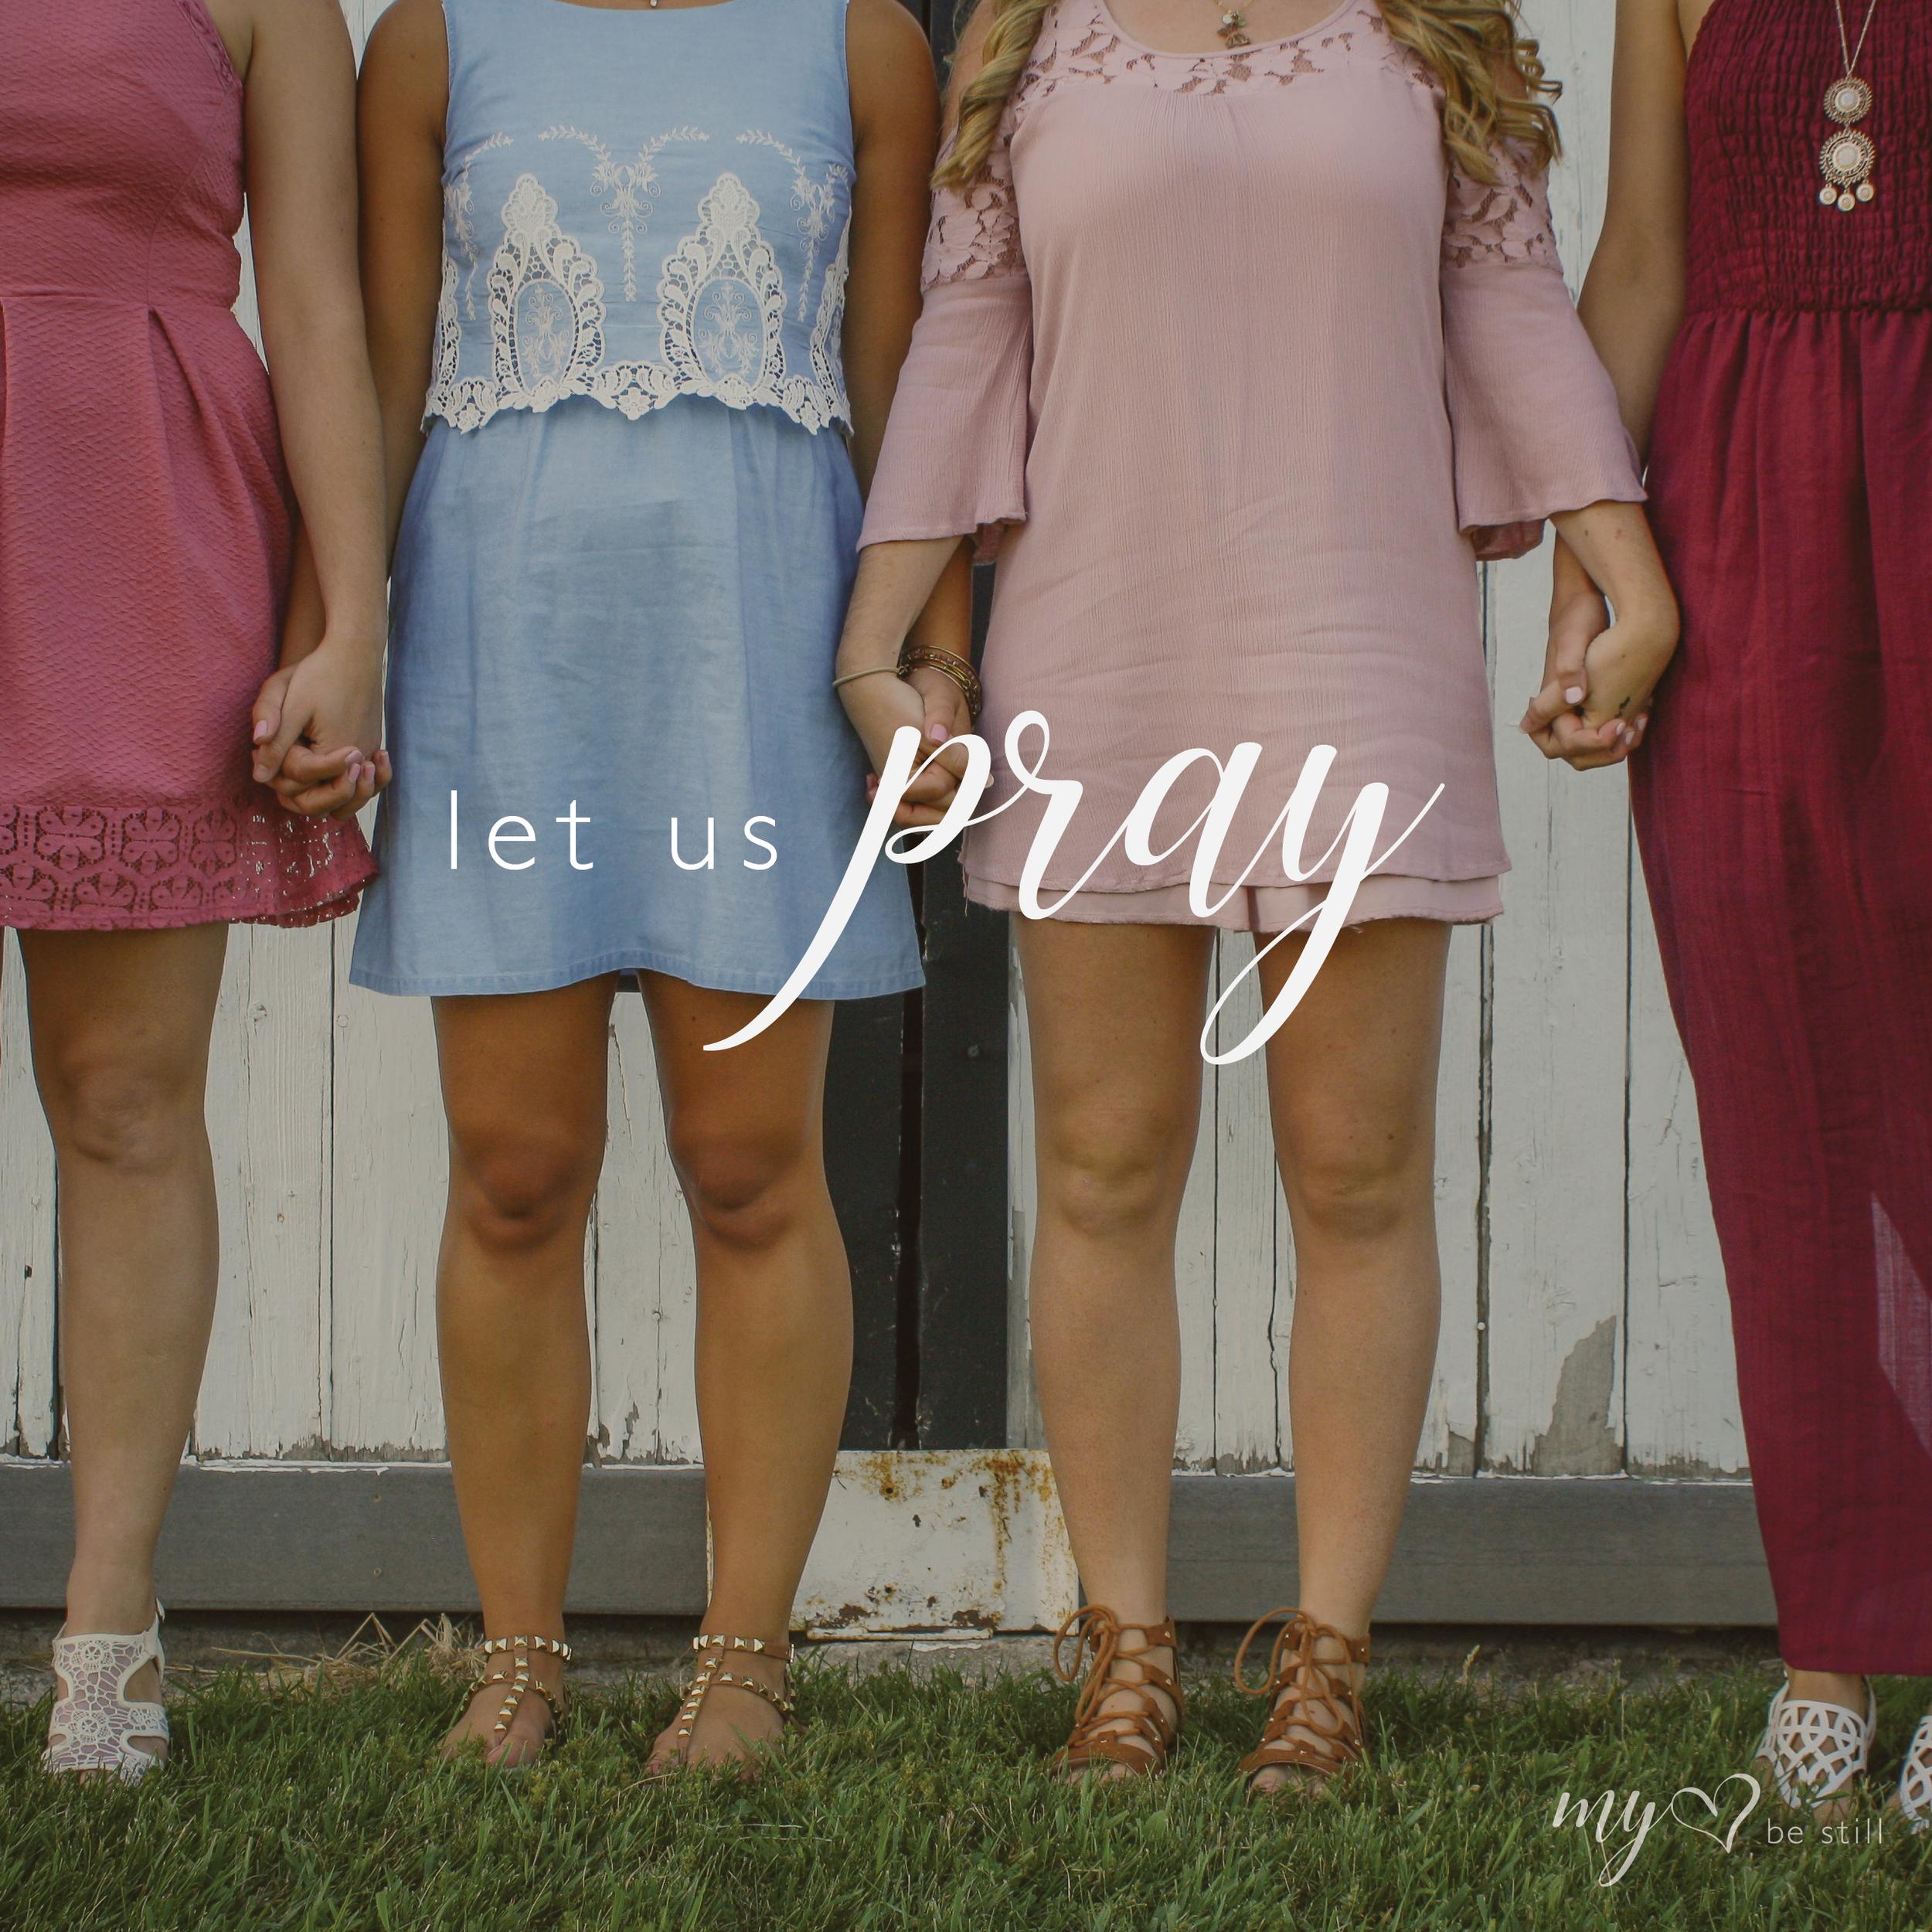 let us pray-02-02.png